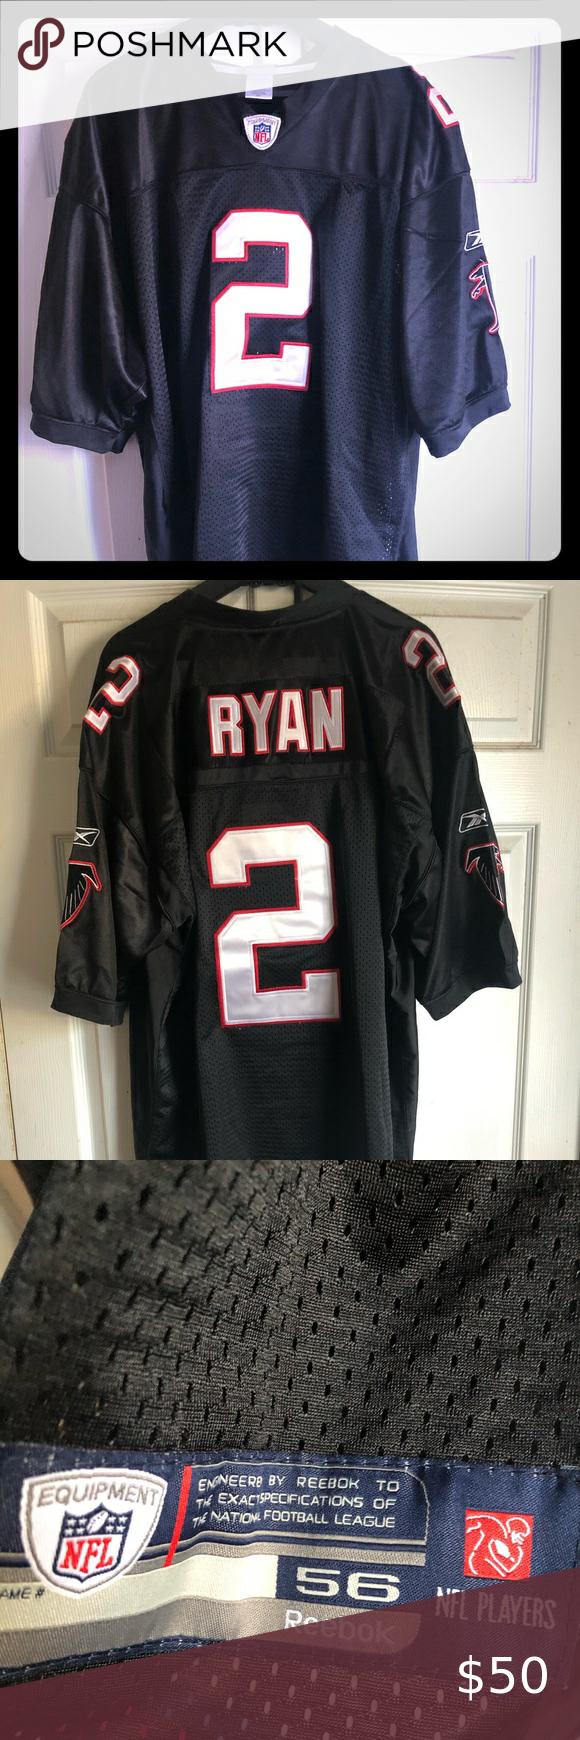 Nfl Atlanta Falcons Matt Ryan Jersey In 2020 Clothes Design Mens Shirts Colorful Shirts